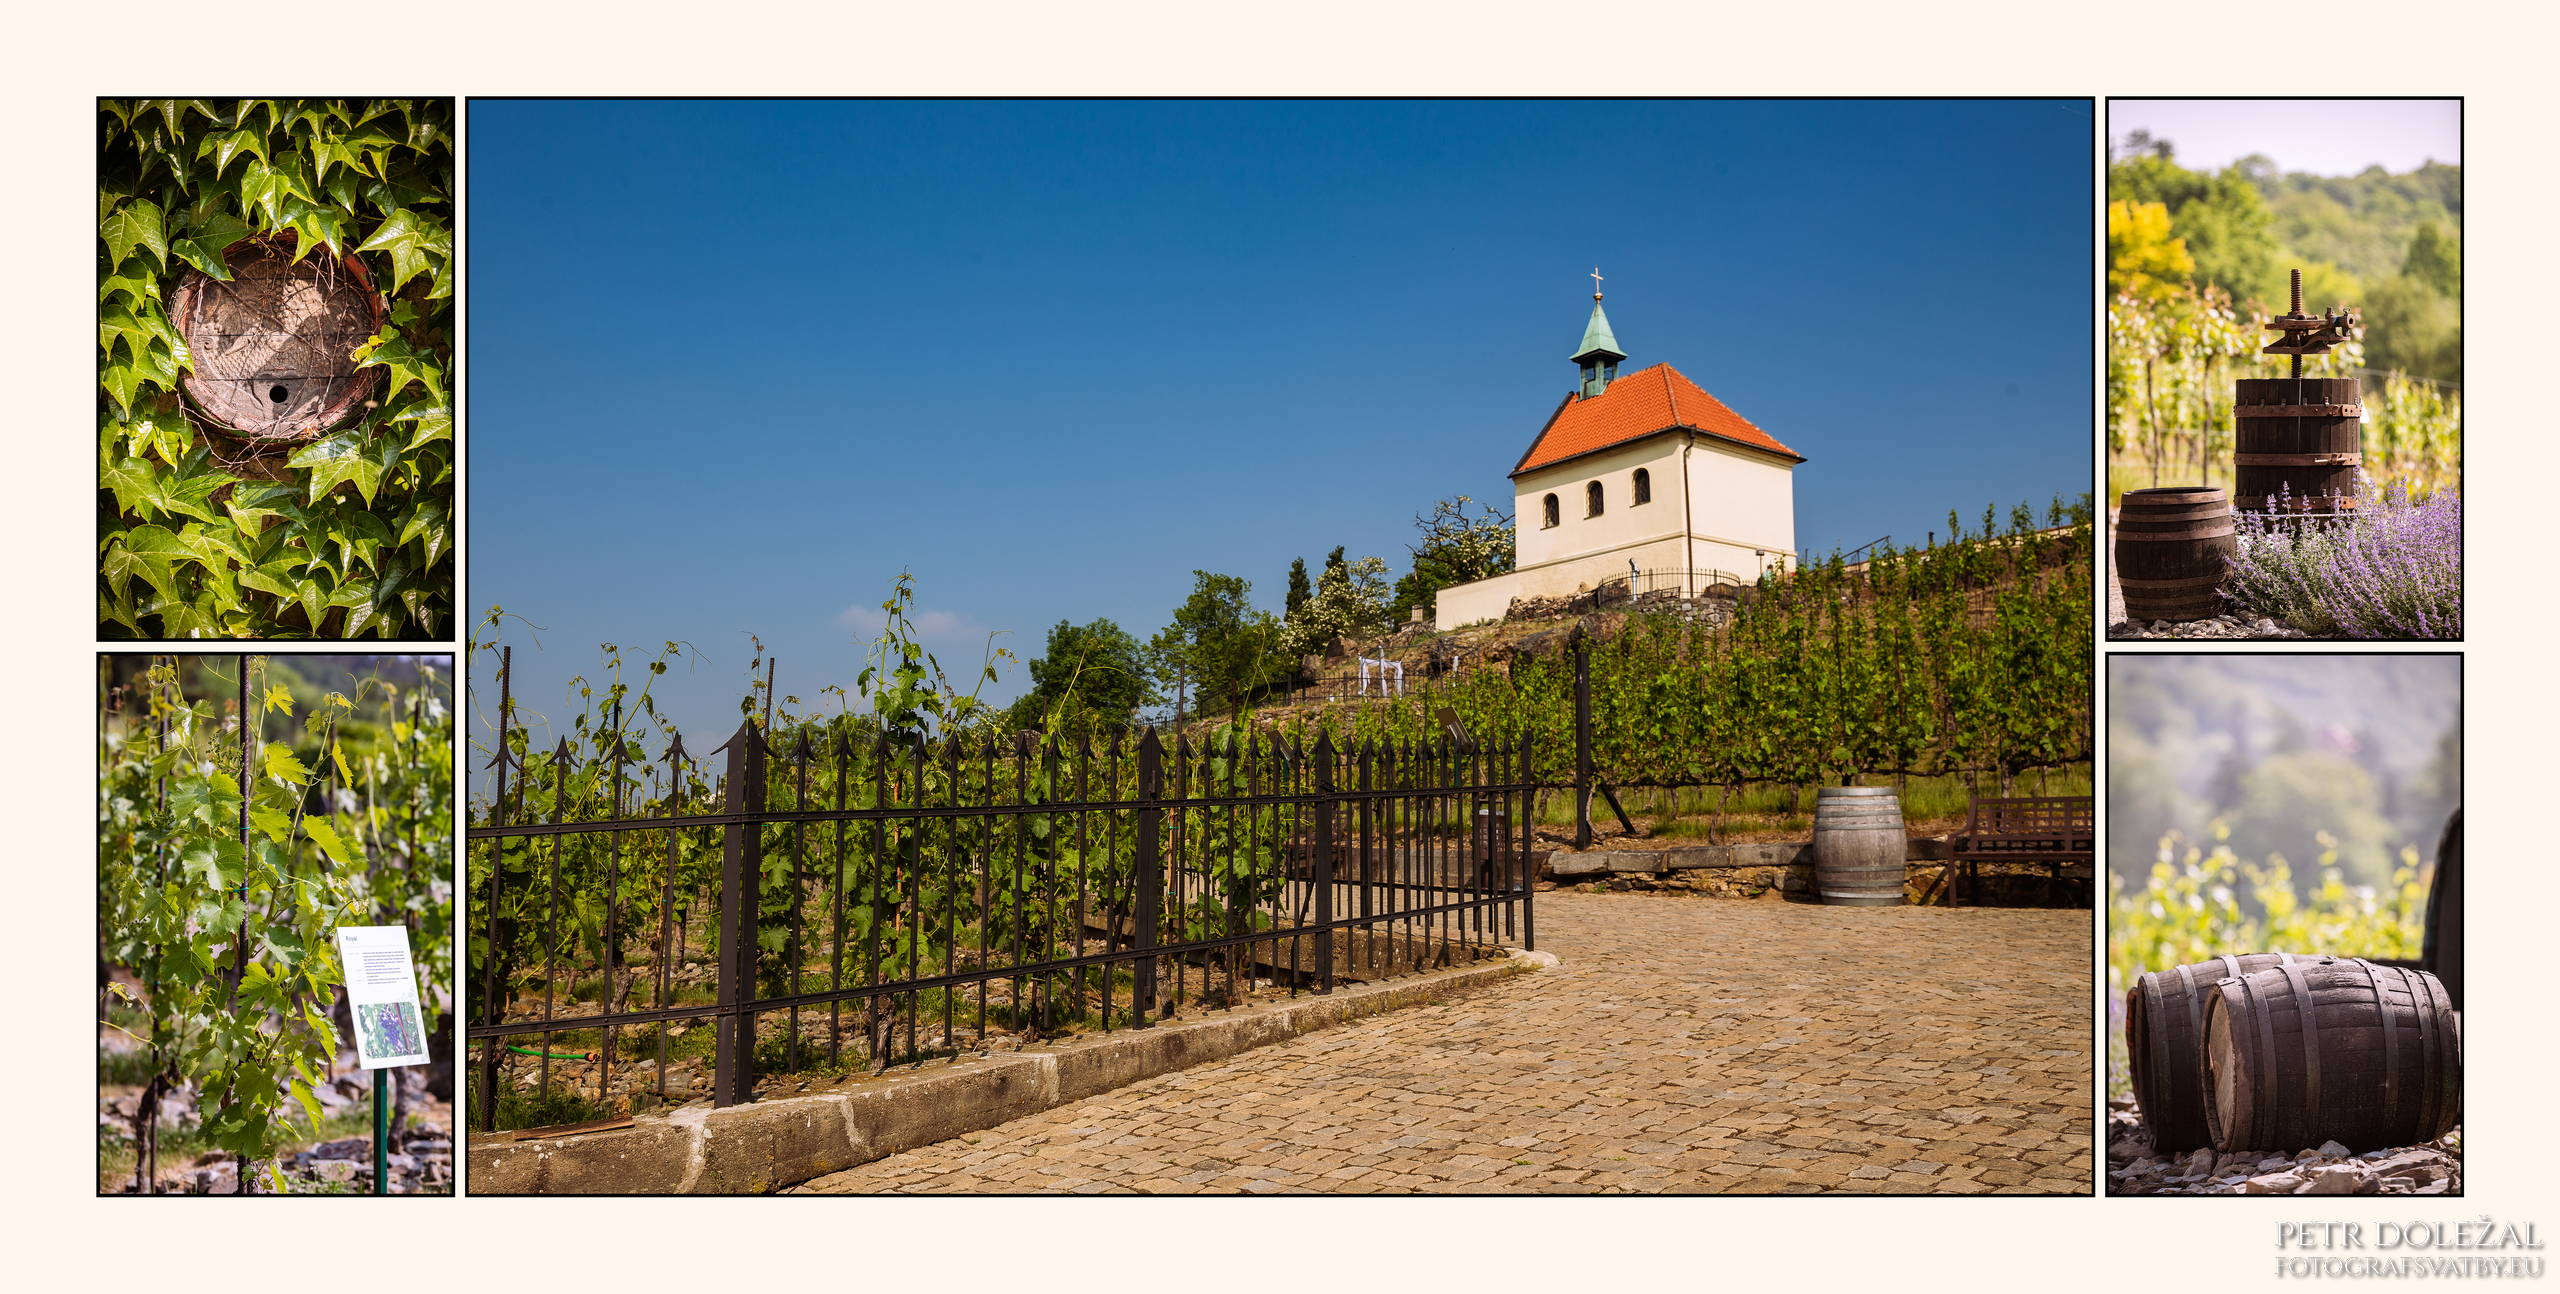 Svatební místa Praha 7 - Botanická zahrada Praha